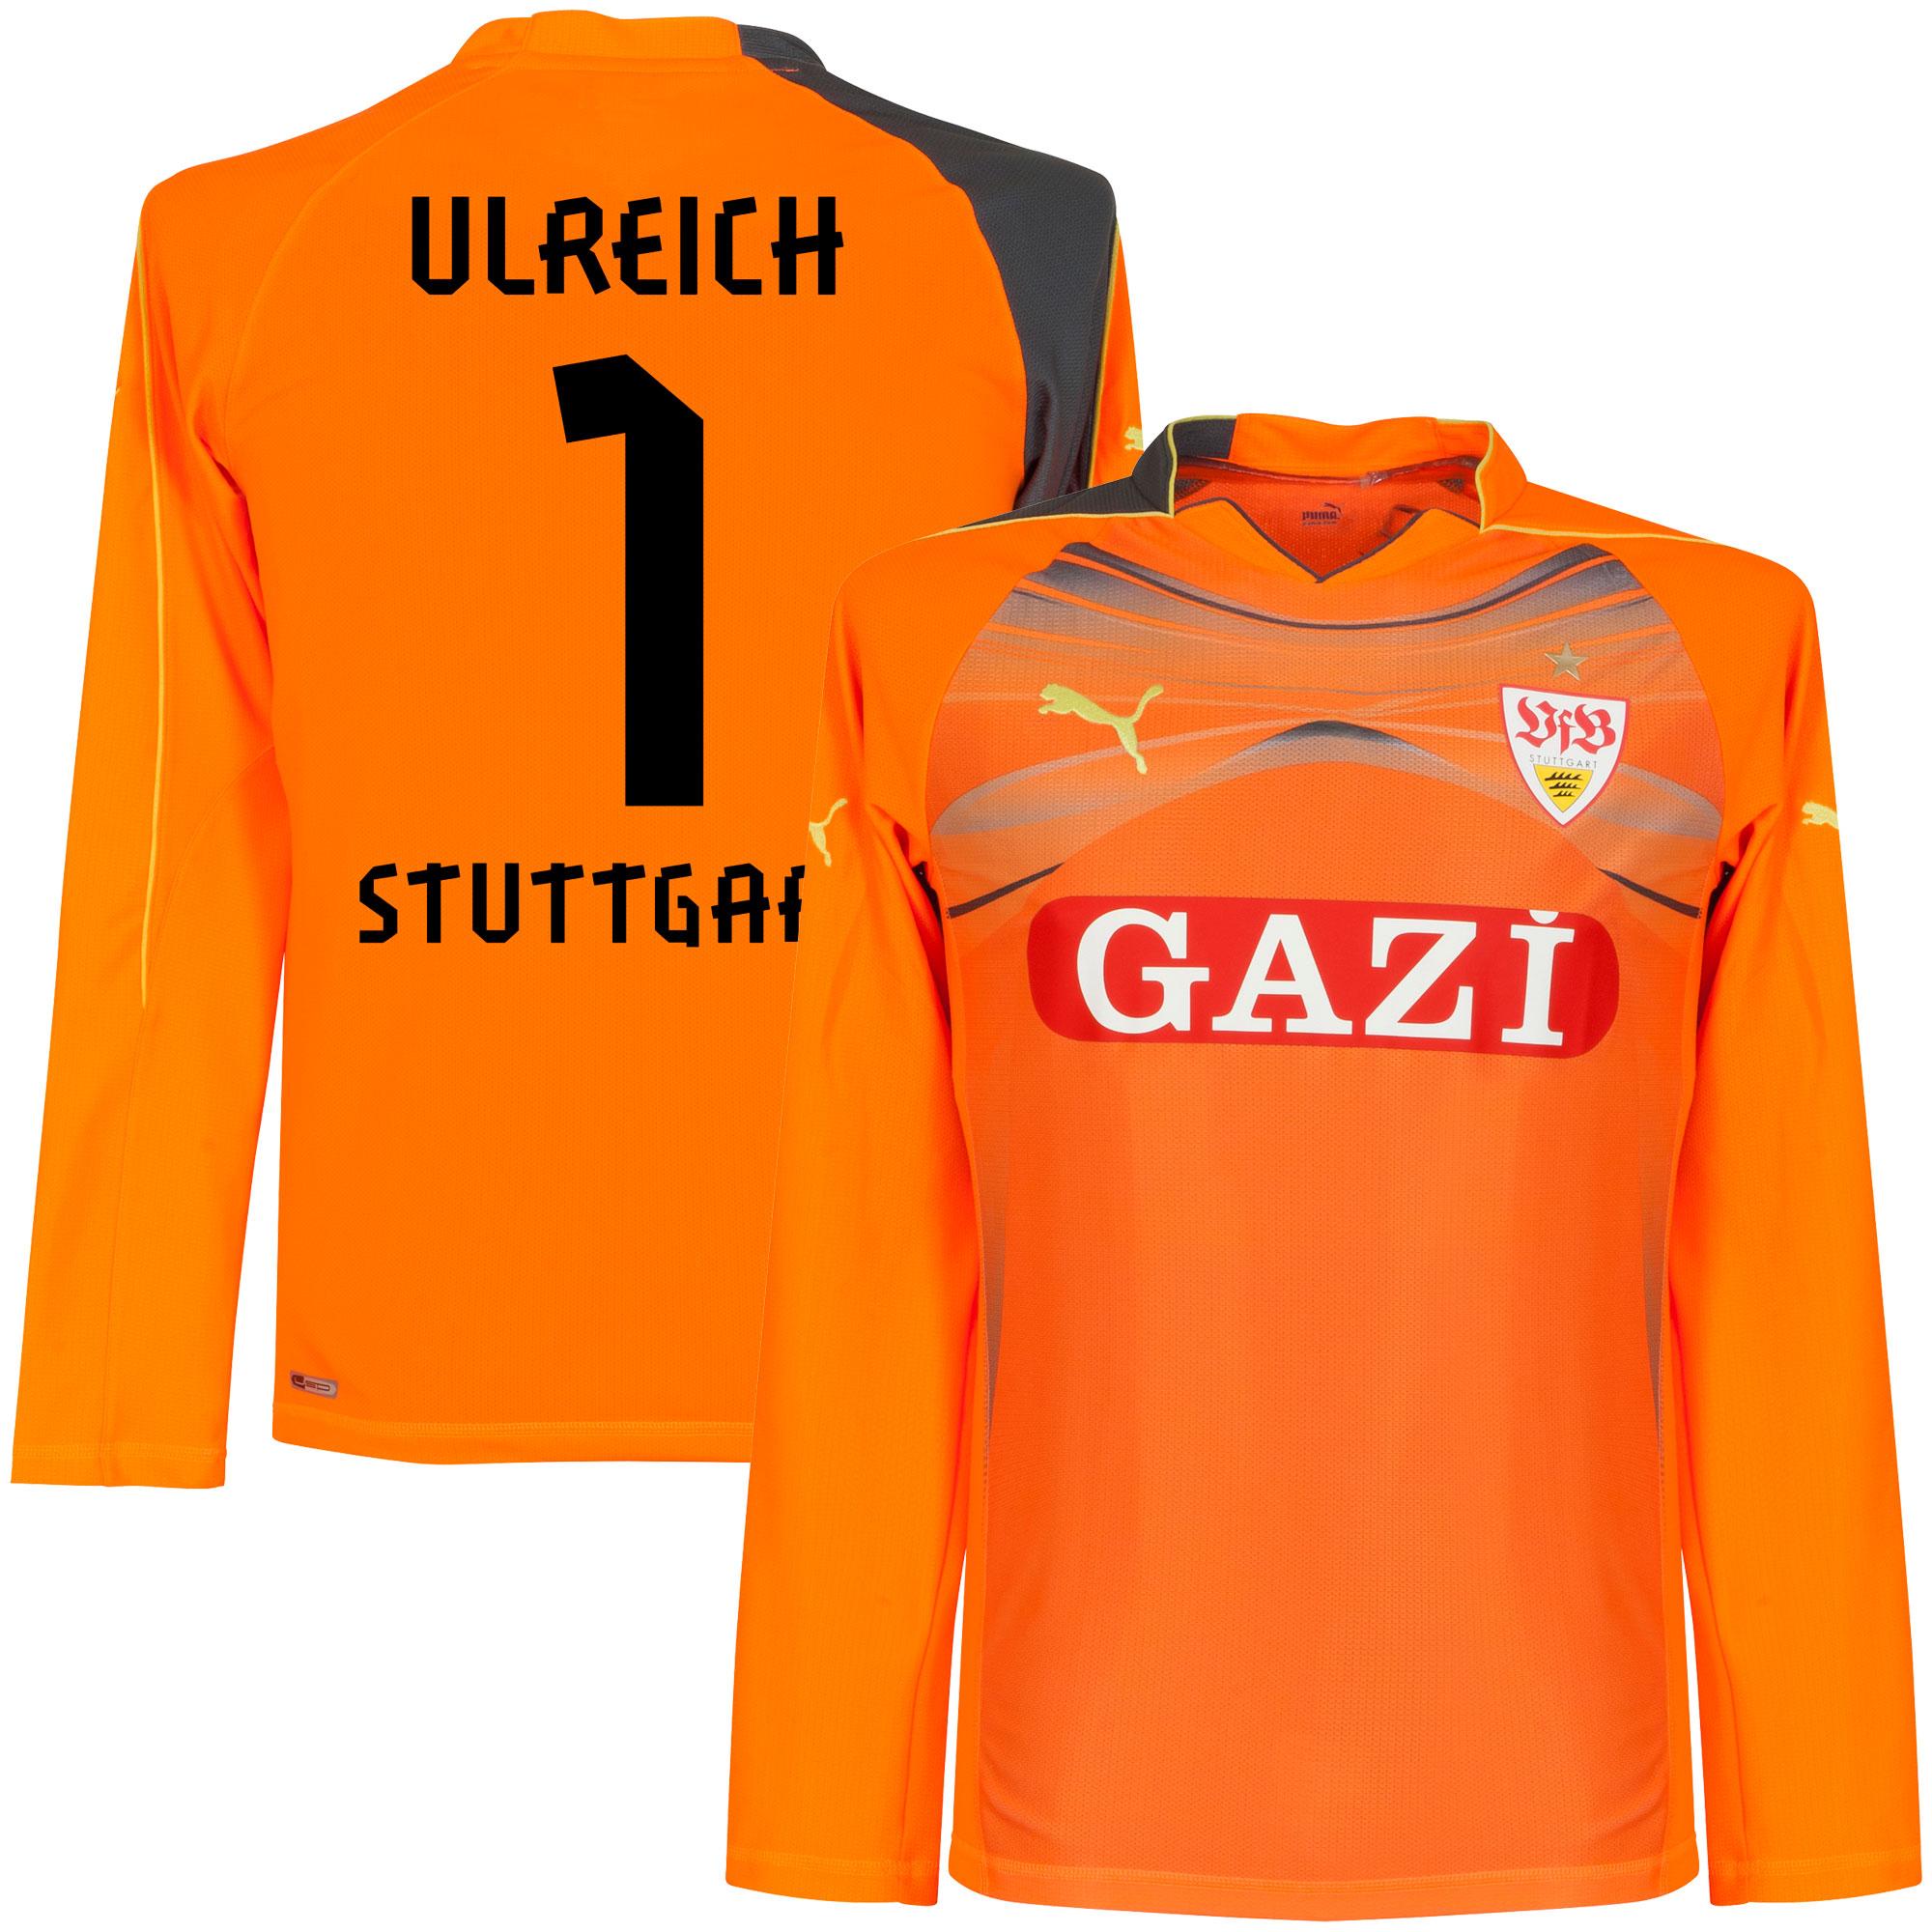 11-12 VfB Stuttgart GK Jersey + Ulreich 1 (Fan Style Printing) - XXL